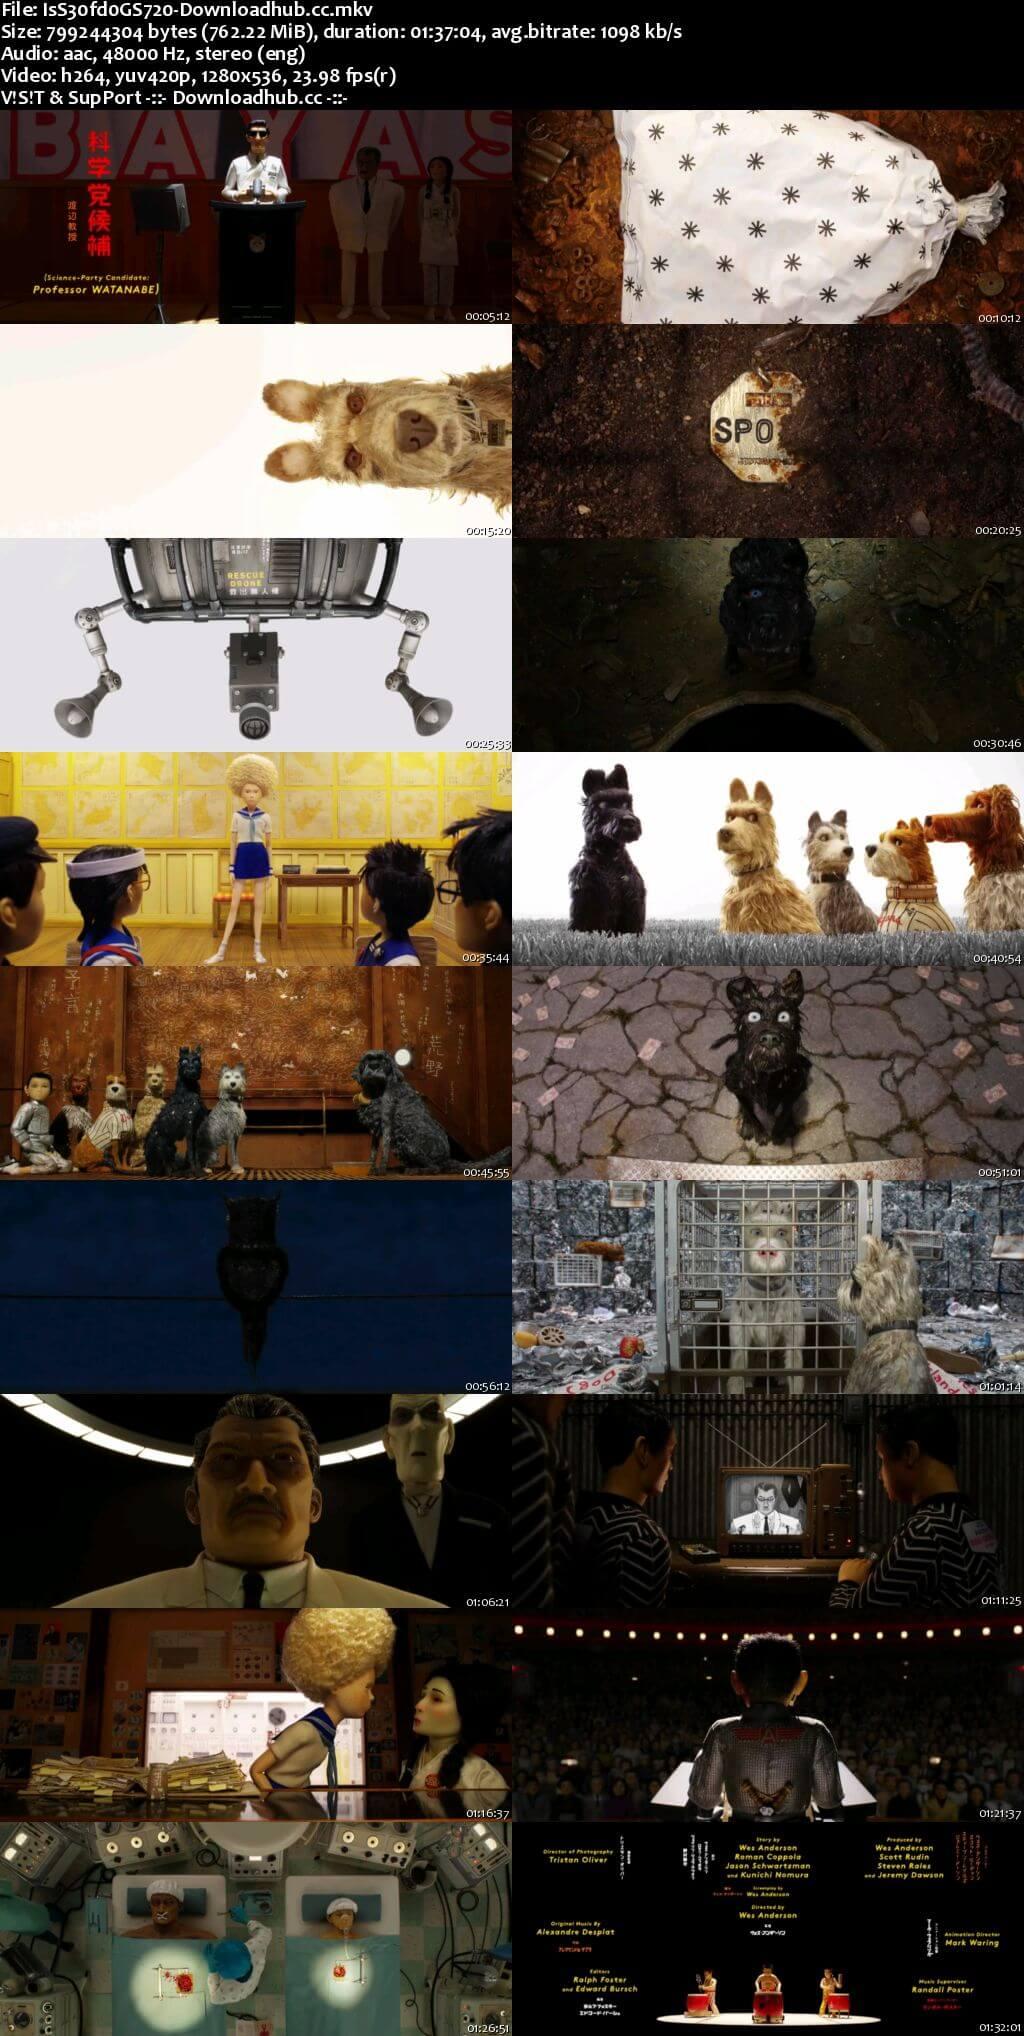 Isle of Dogs 2018 Full English Movie 720p HDRip 750MB